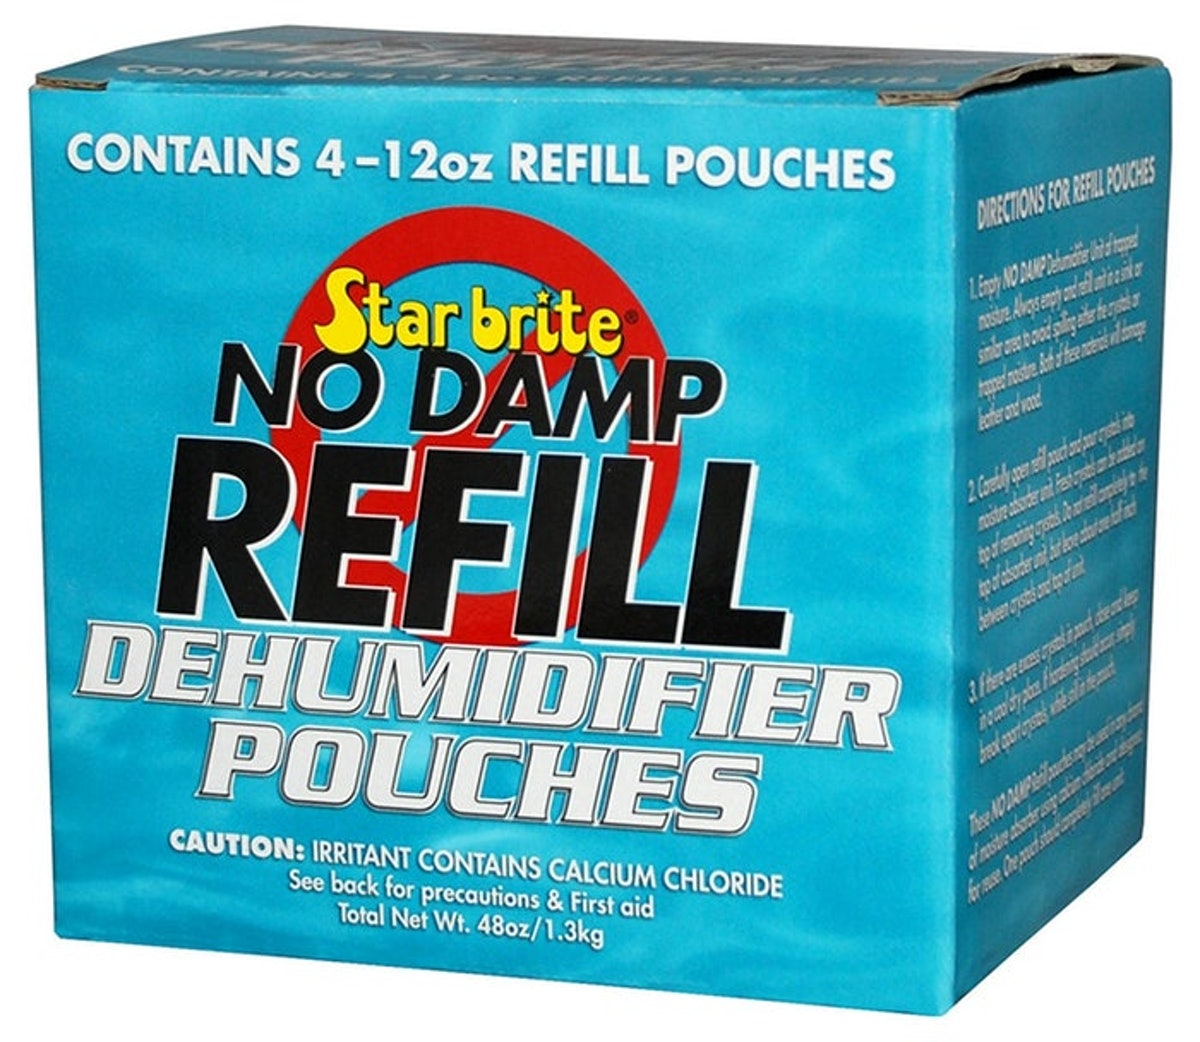 Star Brite No Damp Refill Dehumidifier Pouches